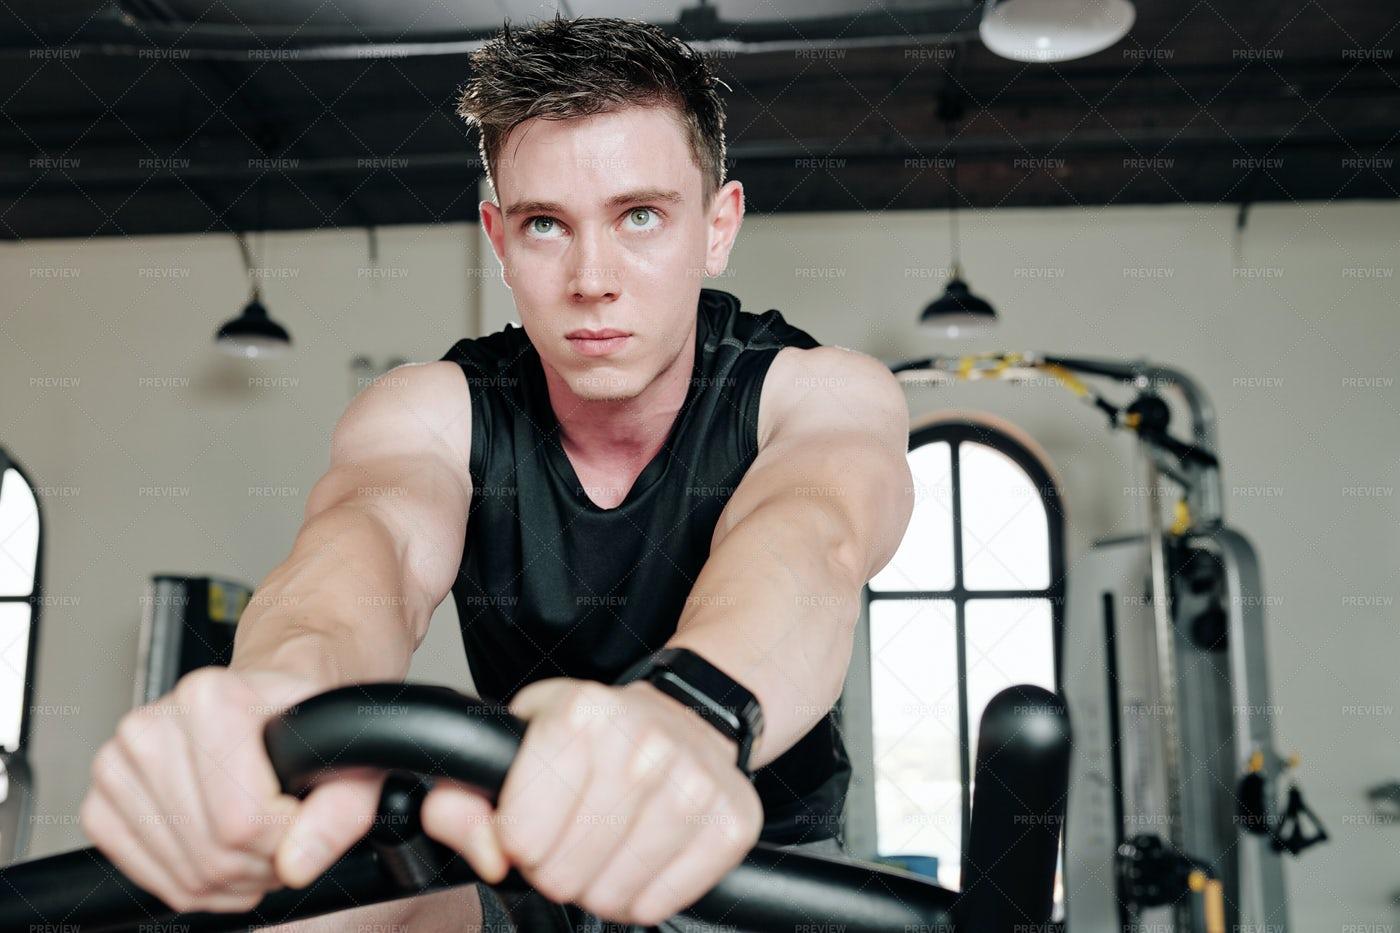 Cardio Training On Stationary Bike: Stock Photos